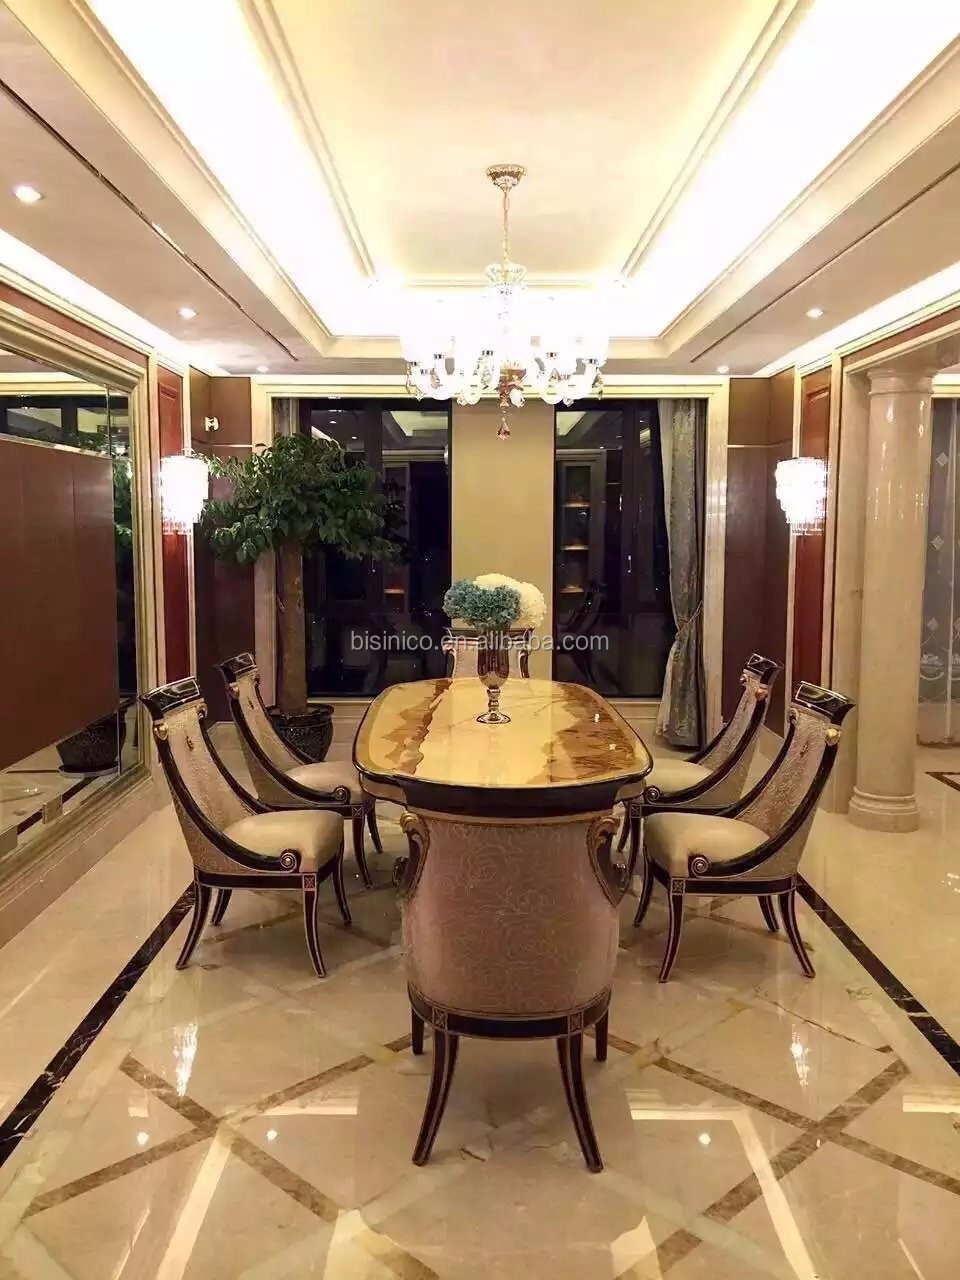 Inggris gaya kayu solid dining room furniture meja makan oval